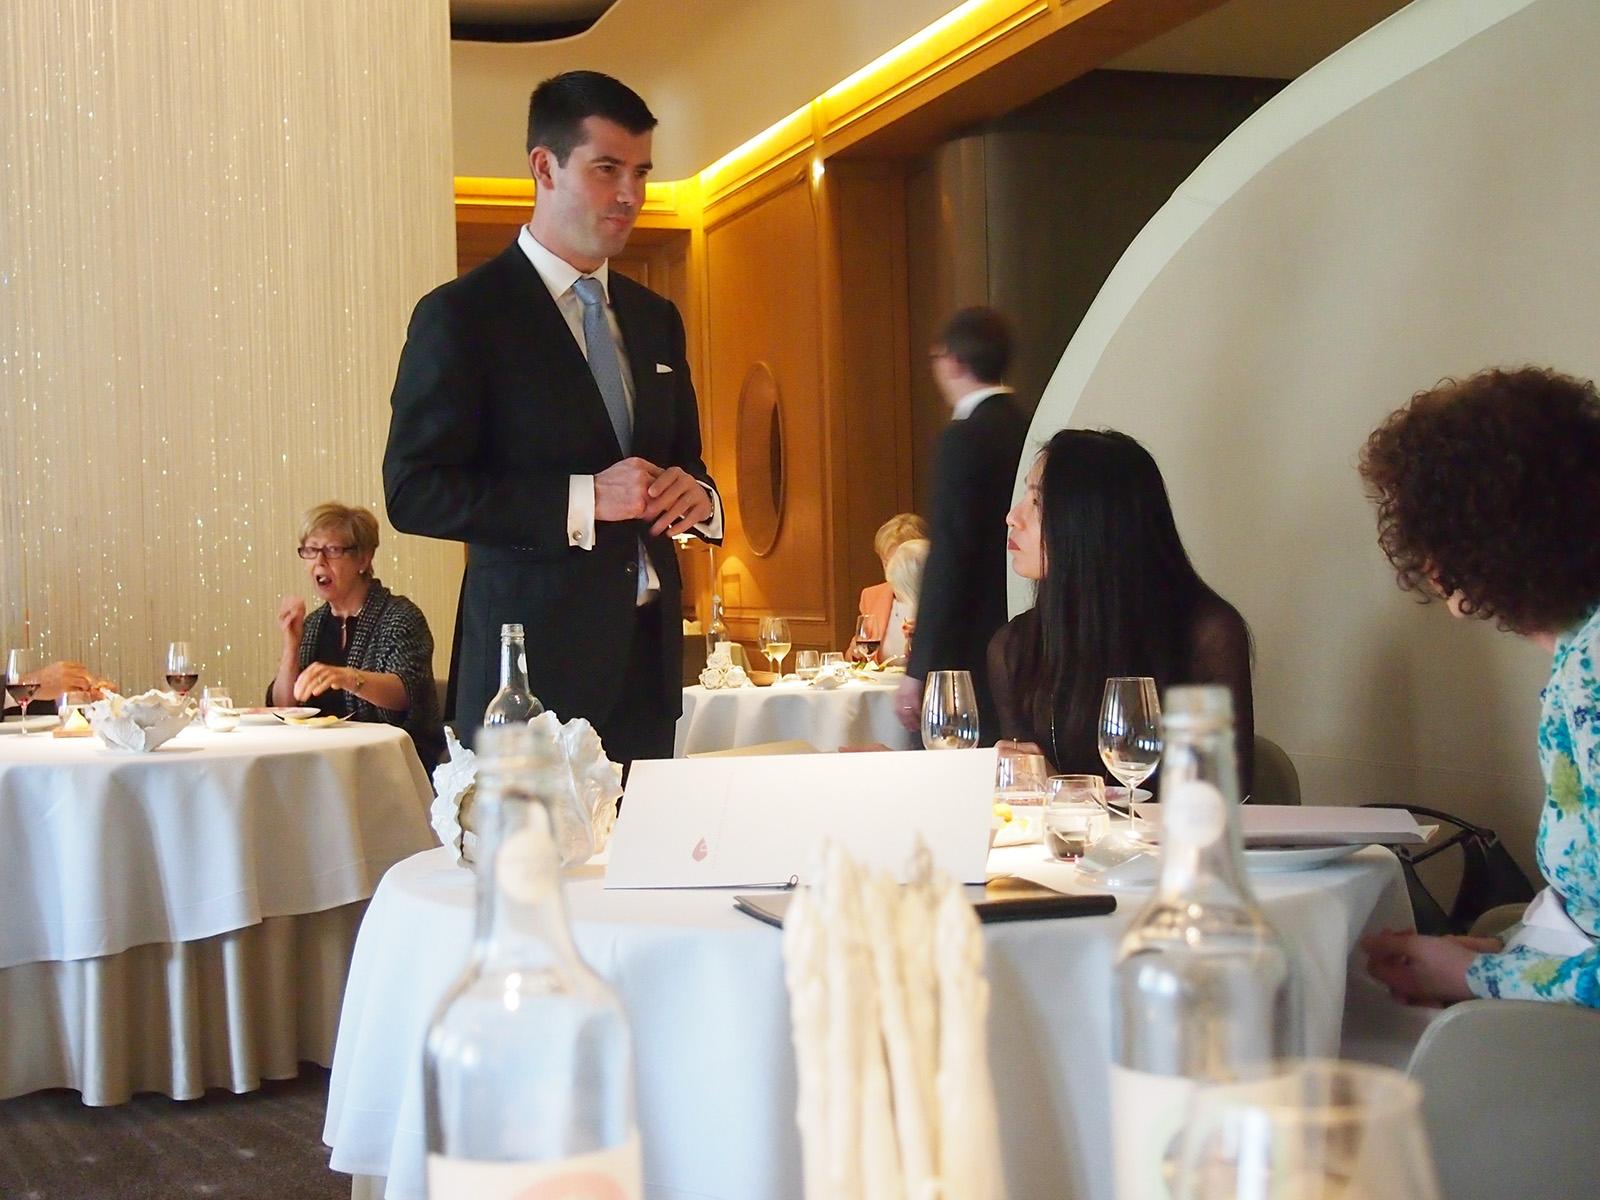 Interiér restaurace Alain Ducasse v Londýně